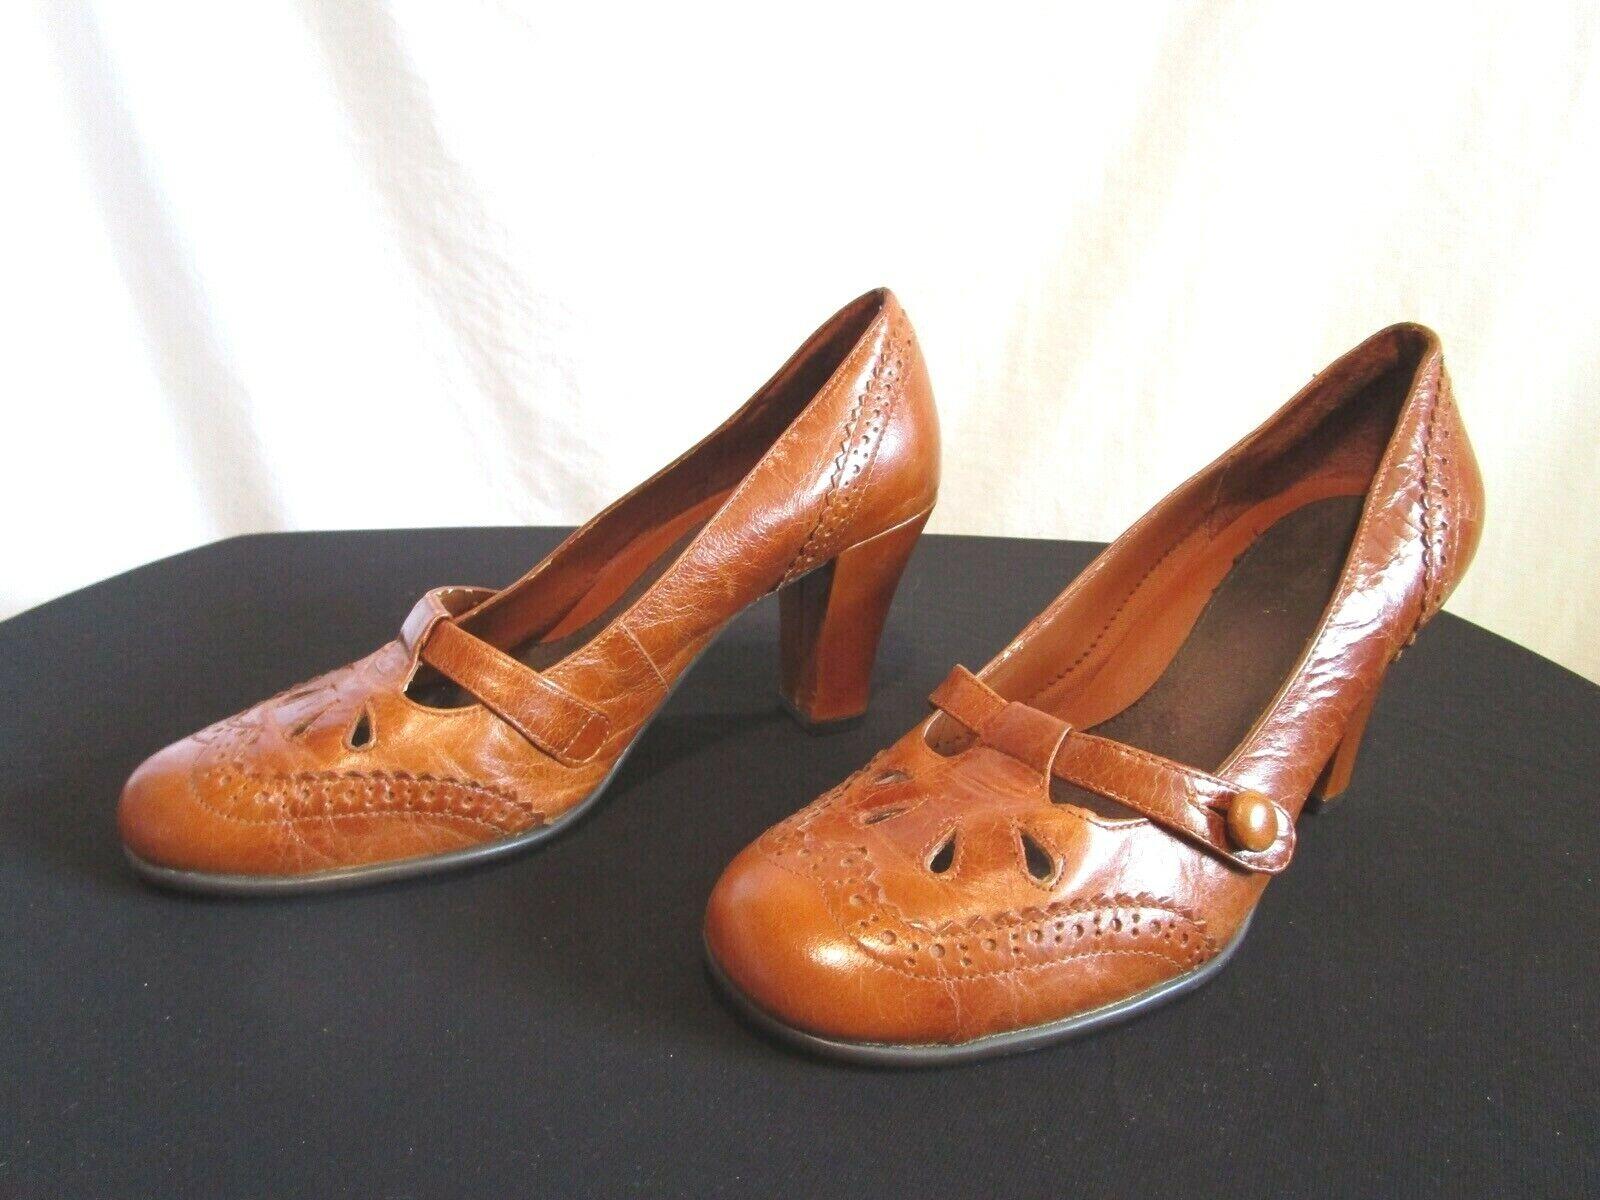 Aerosoles Carolina Brown Leather Round Toe Pumps Heels Shoes Size 6.5 M